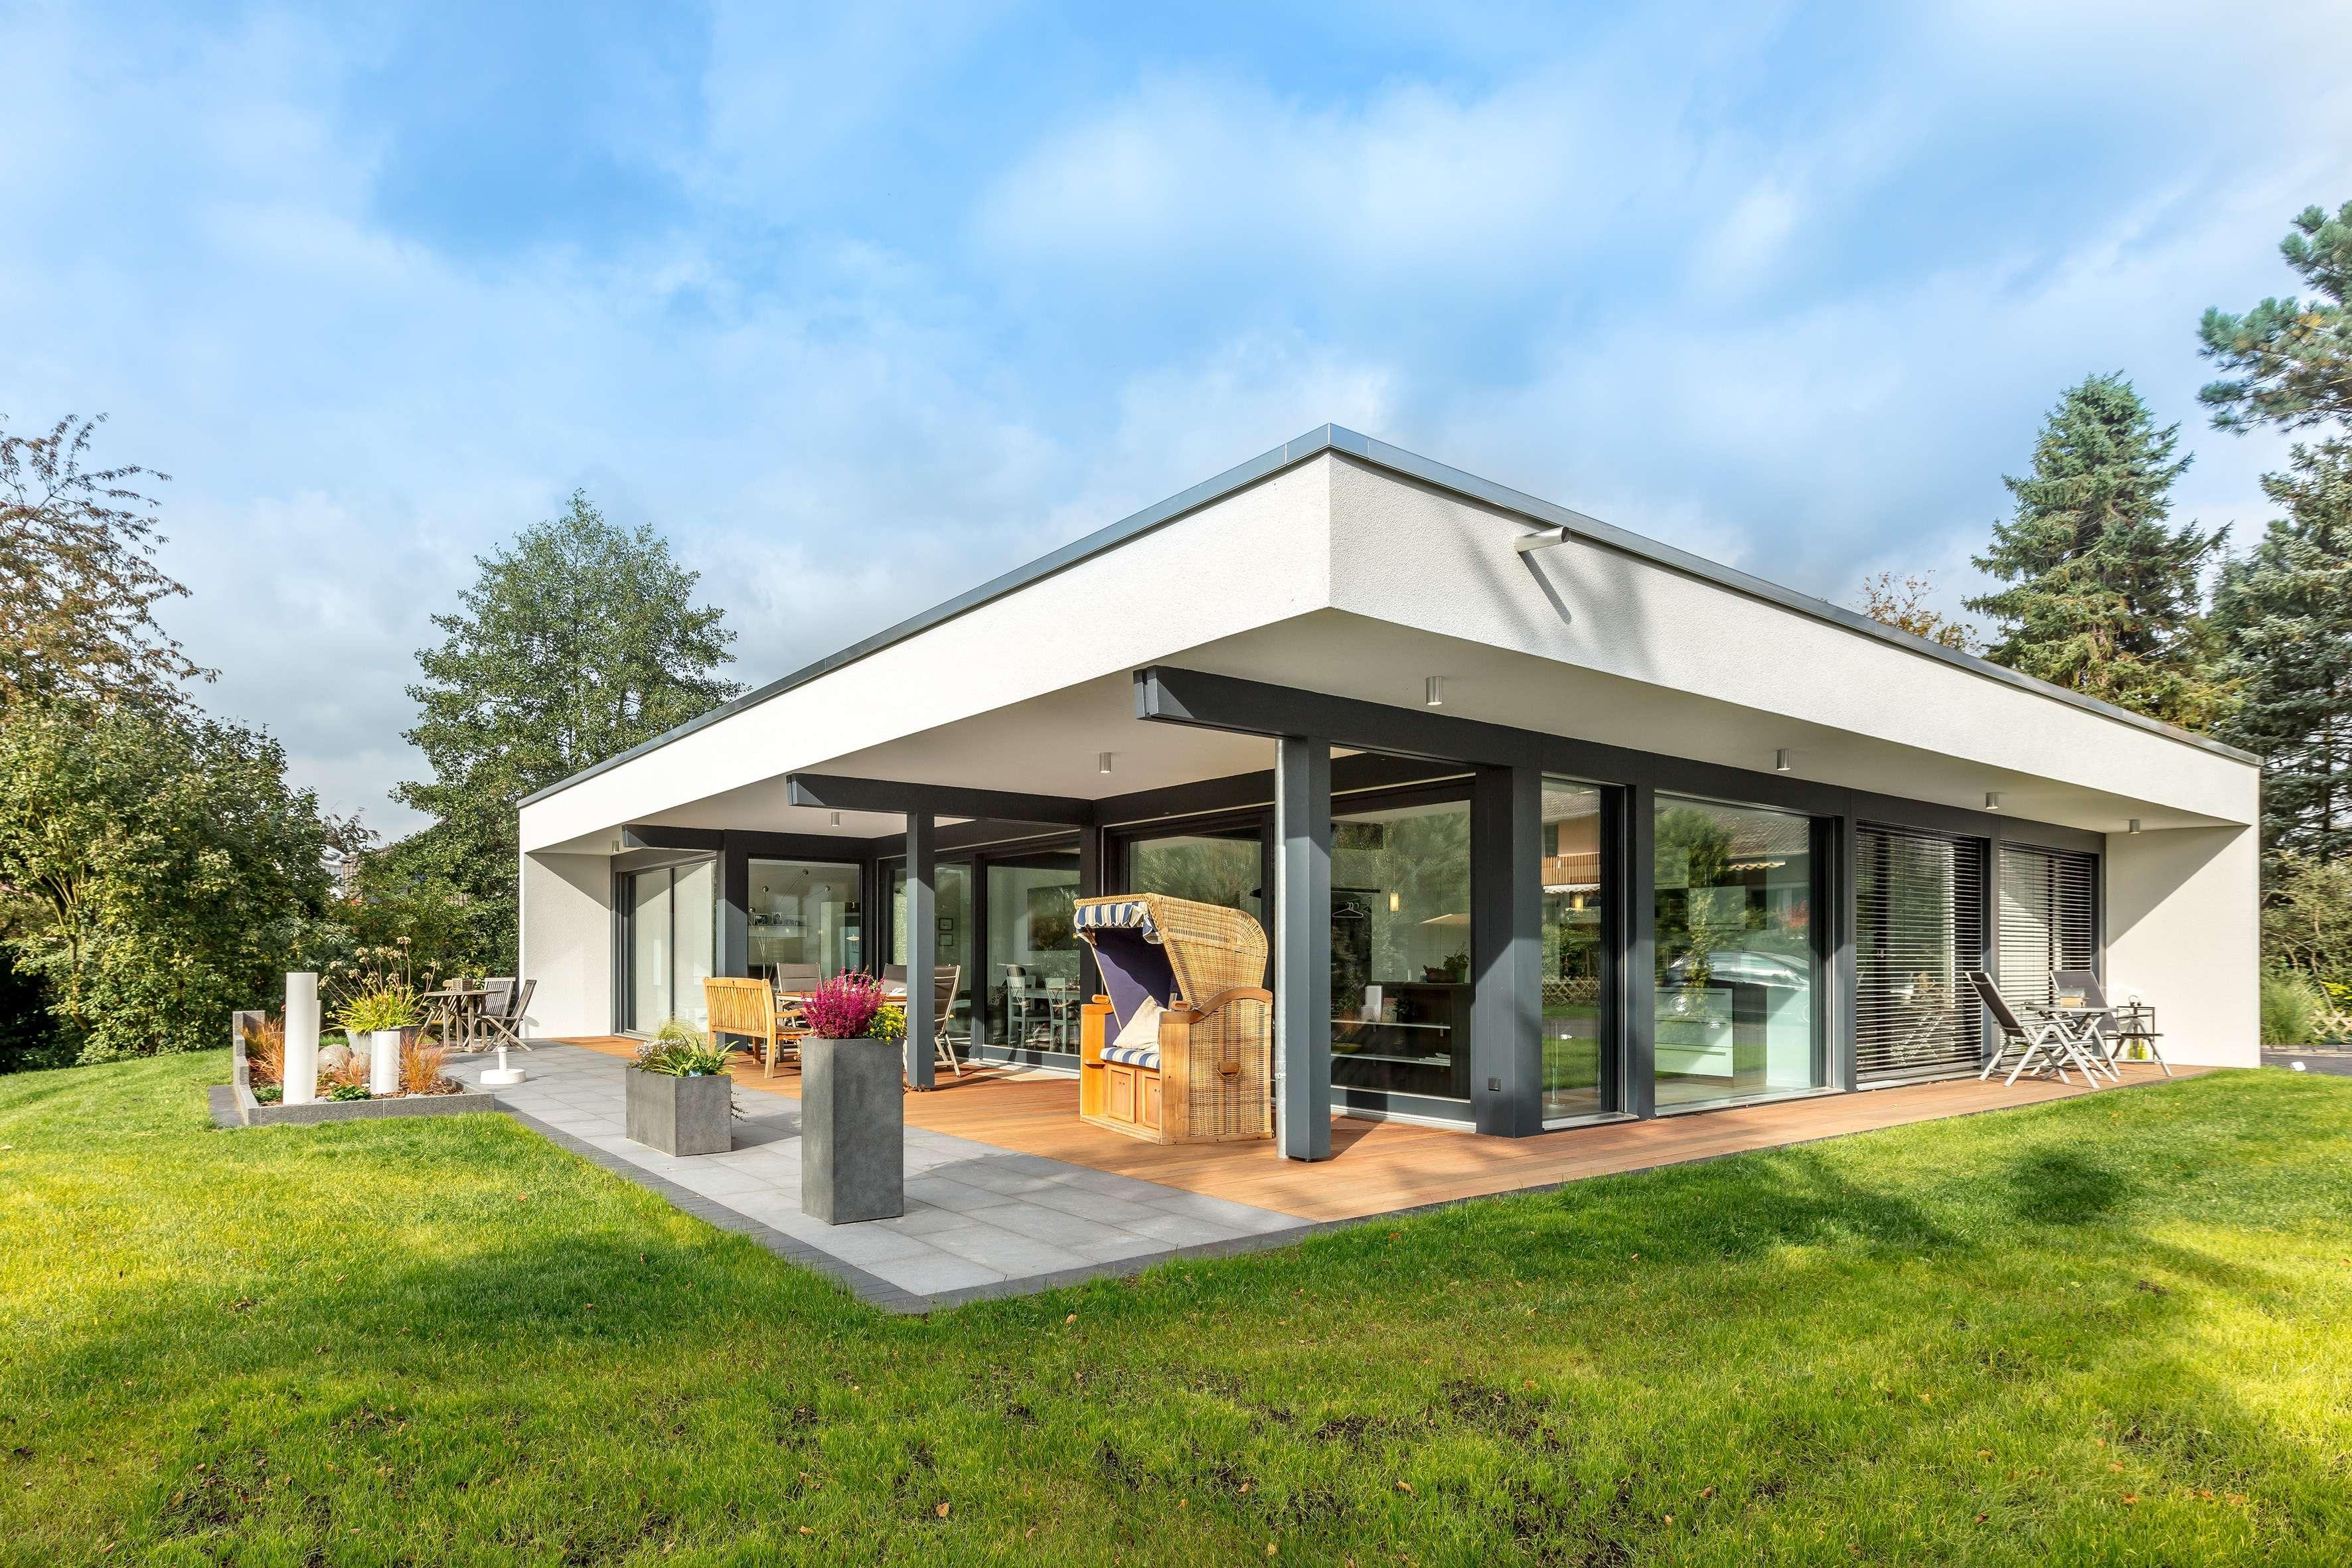 fertigh user sind architektenh user. Black Bedroom Furniture Sets. Home Design Ideas